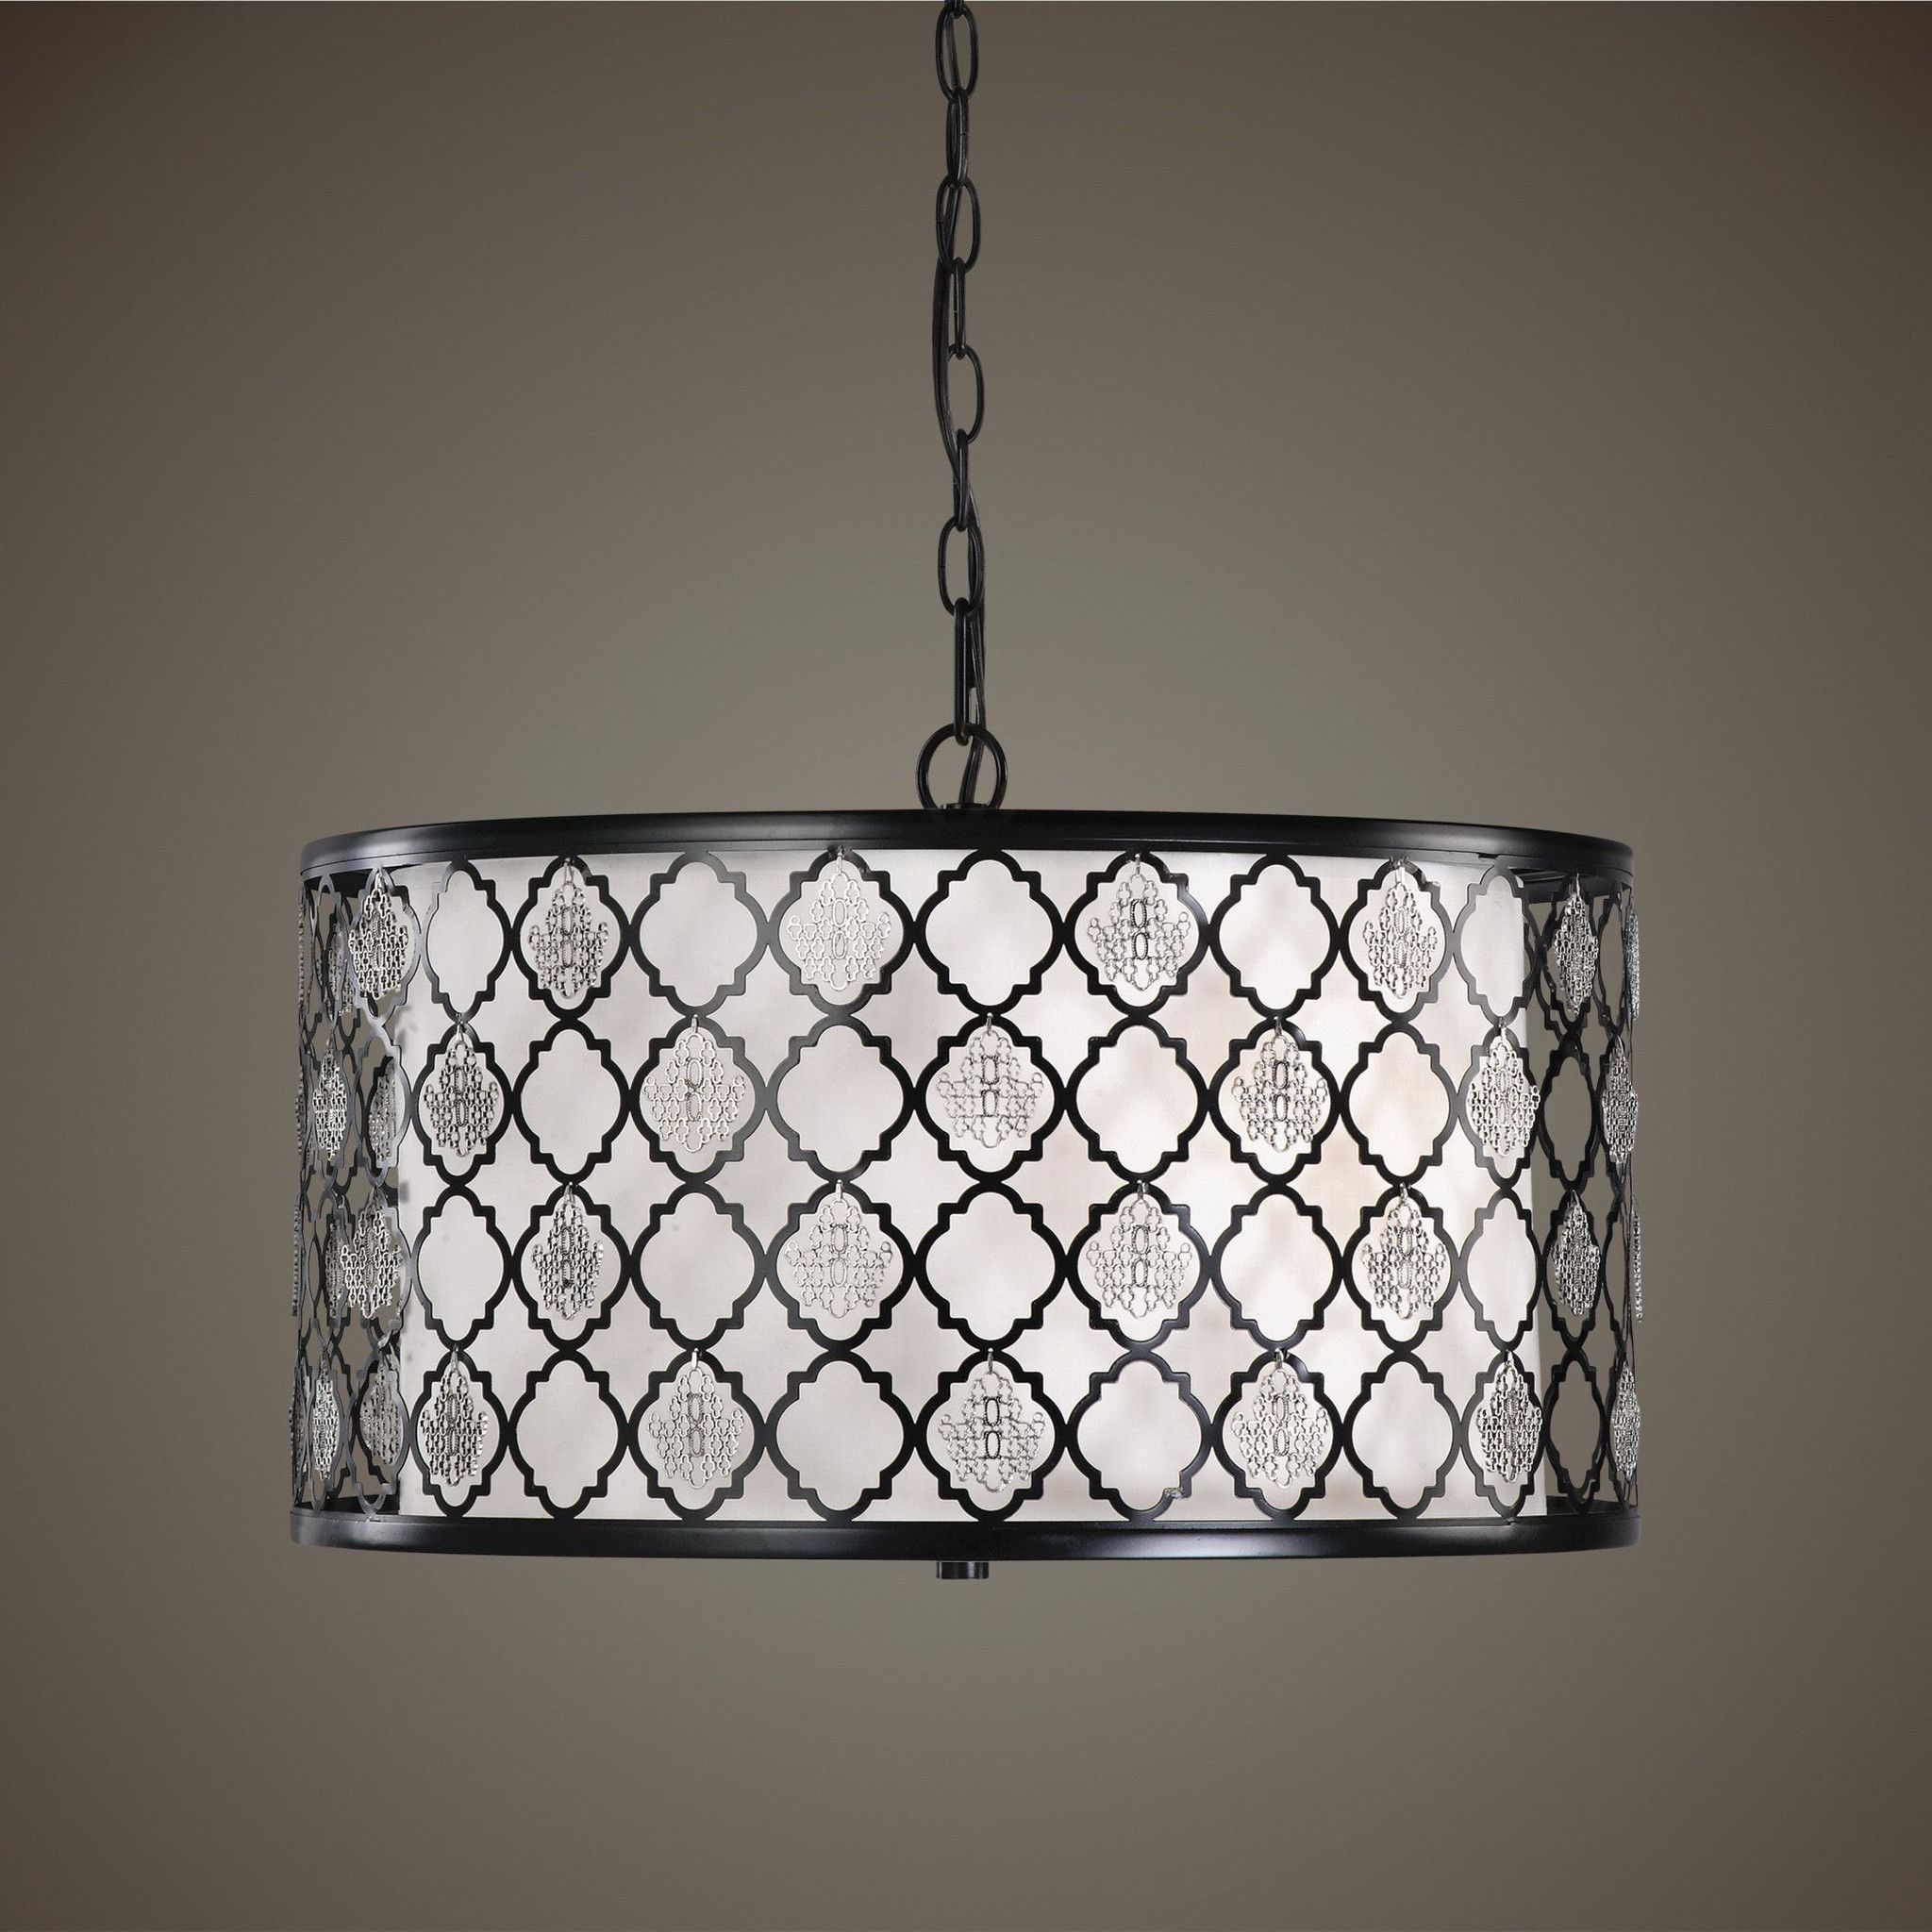 Filigree light drum pendant pendants changue and lights